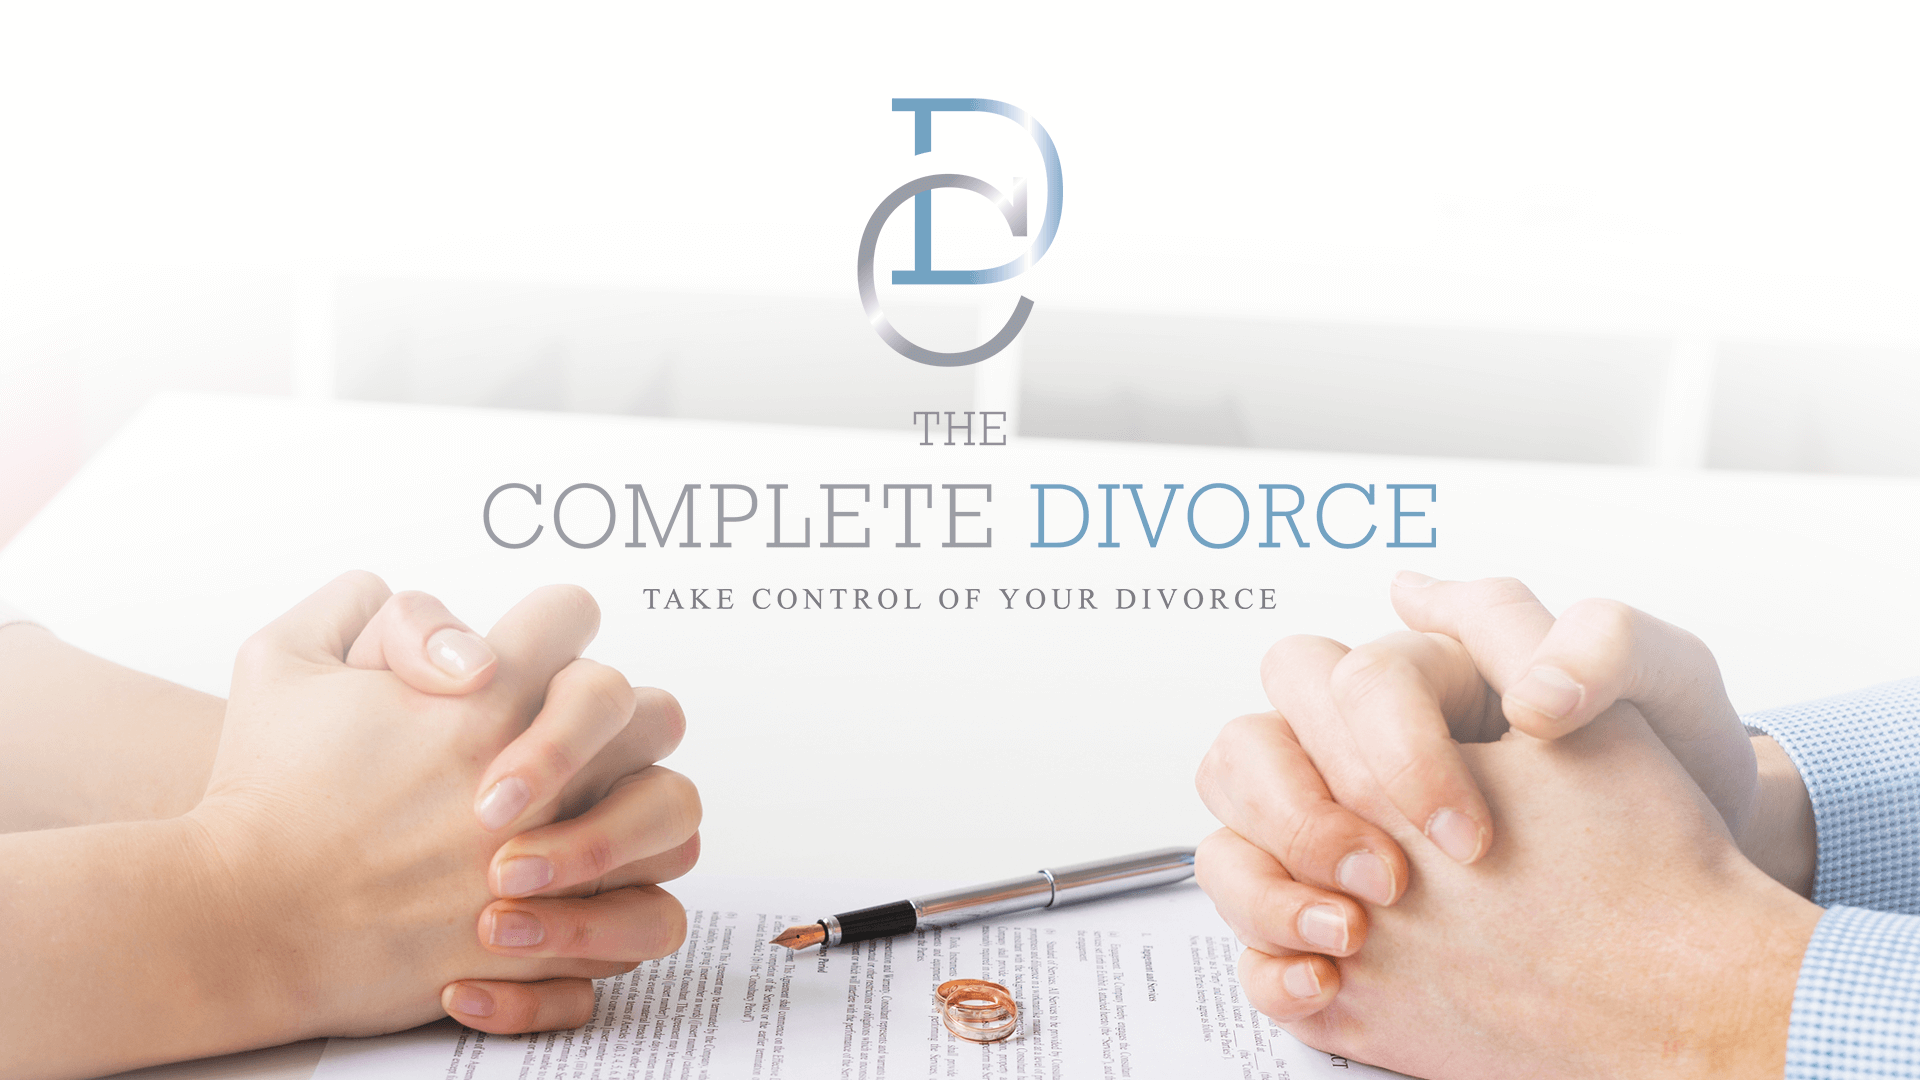 The Complete Divorce (Complete)